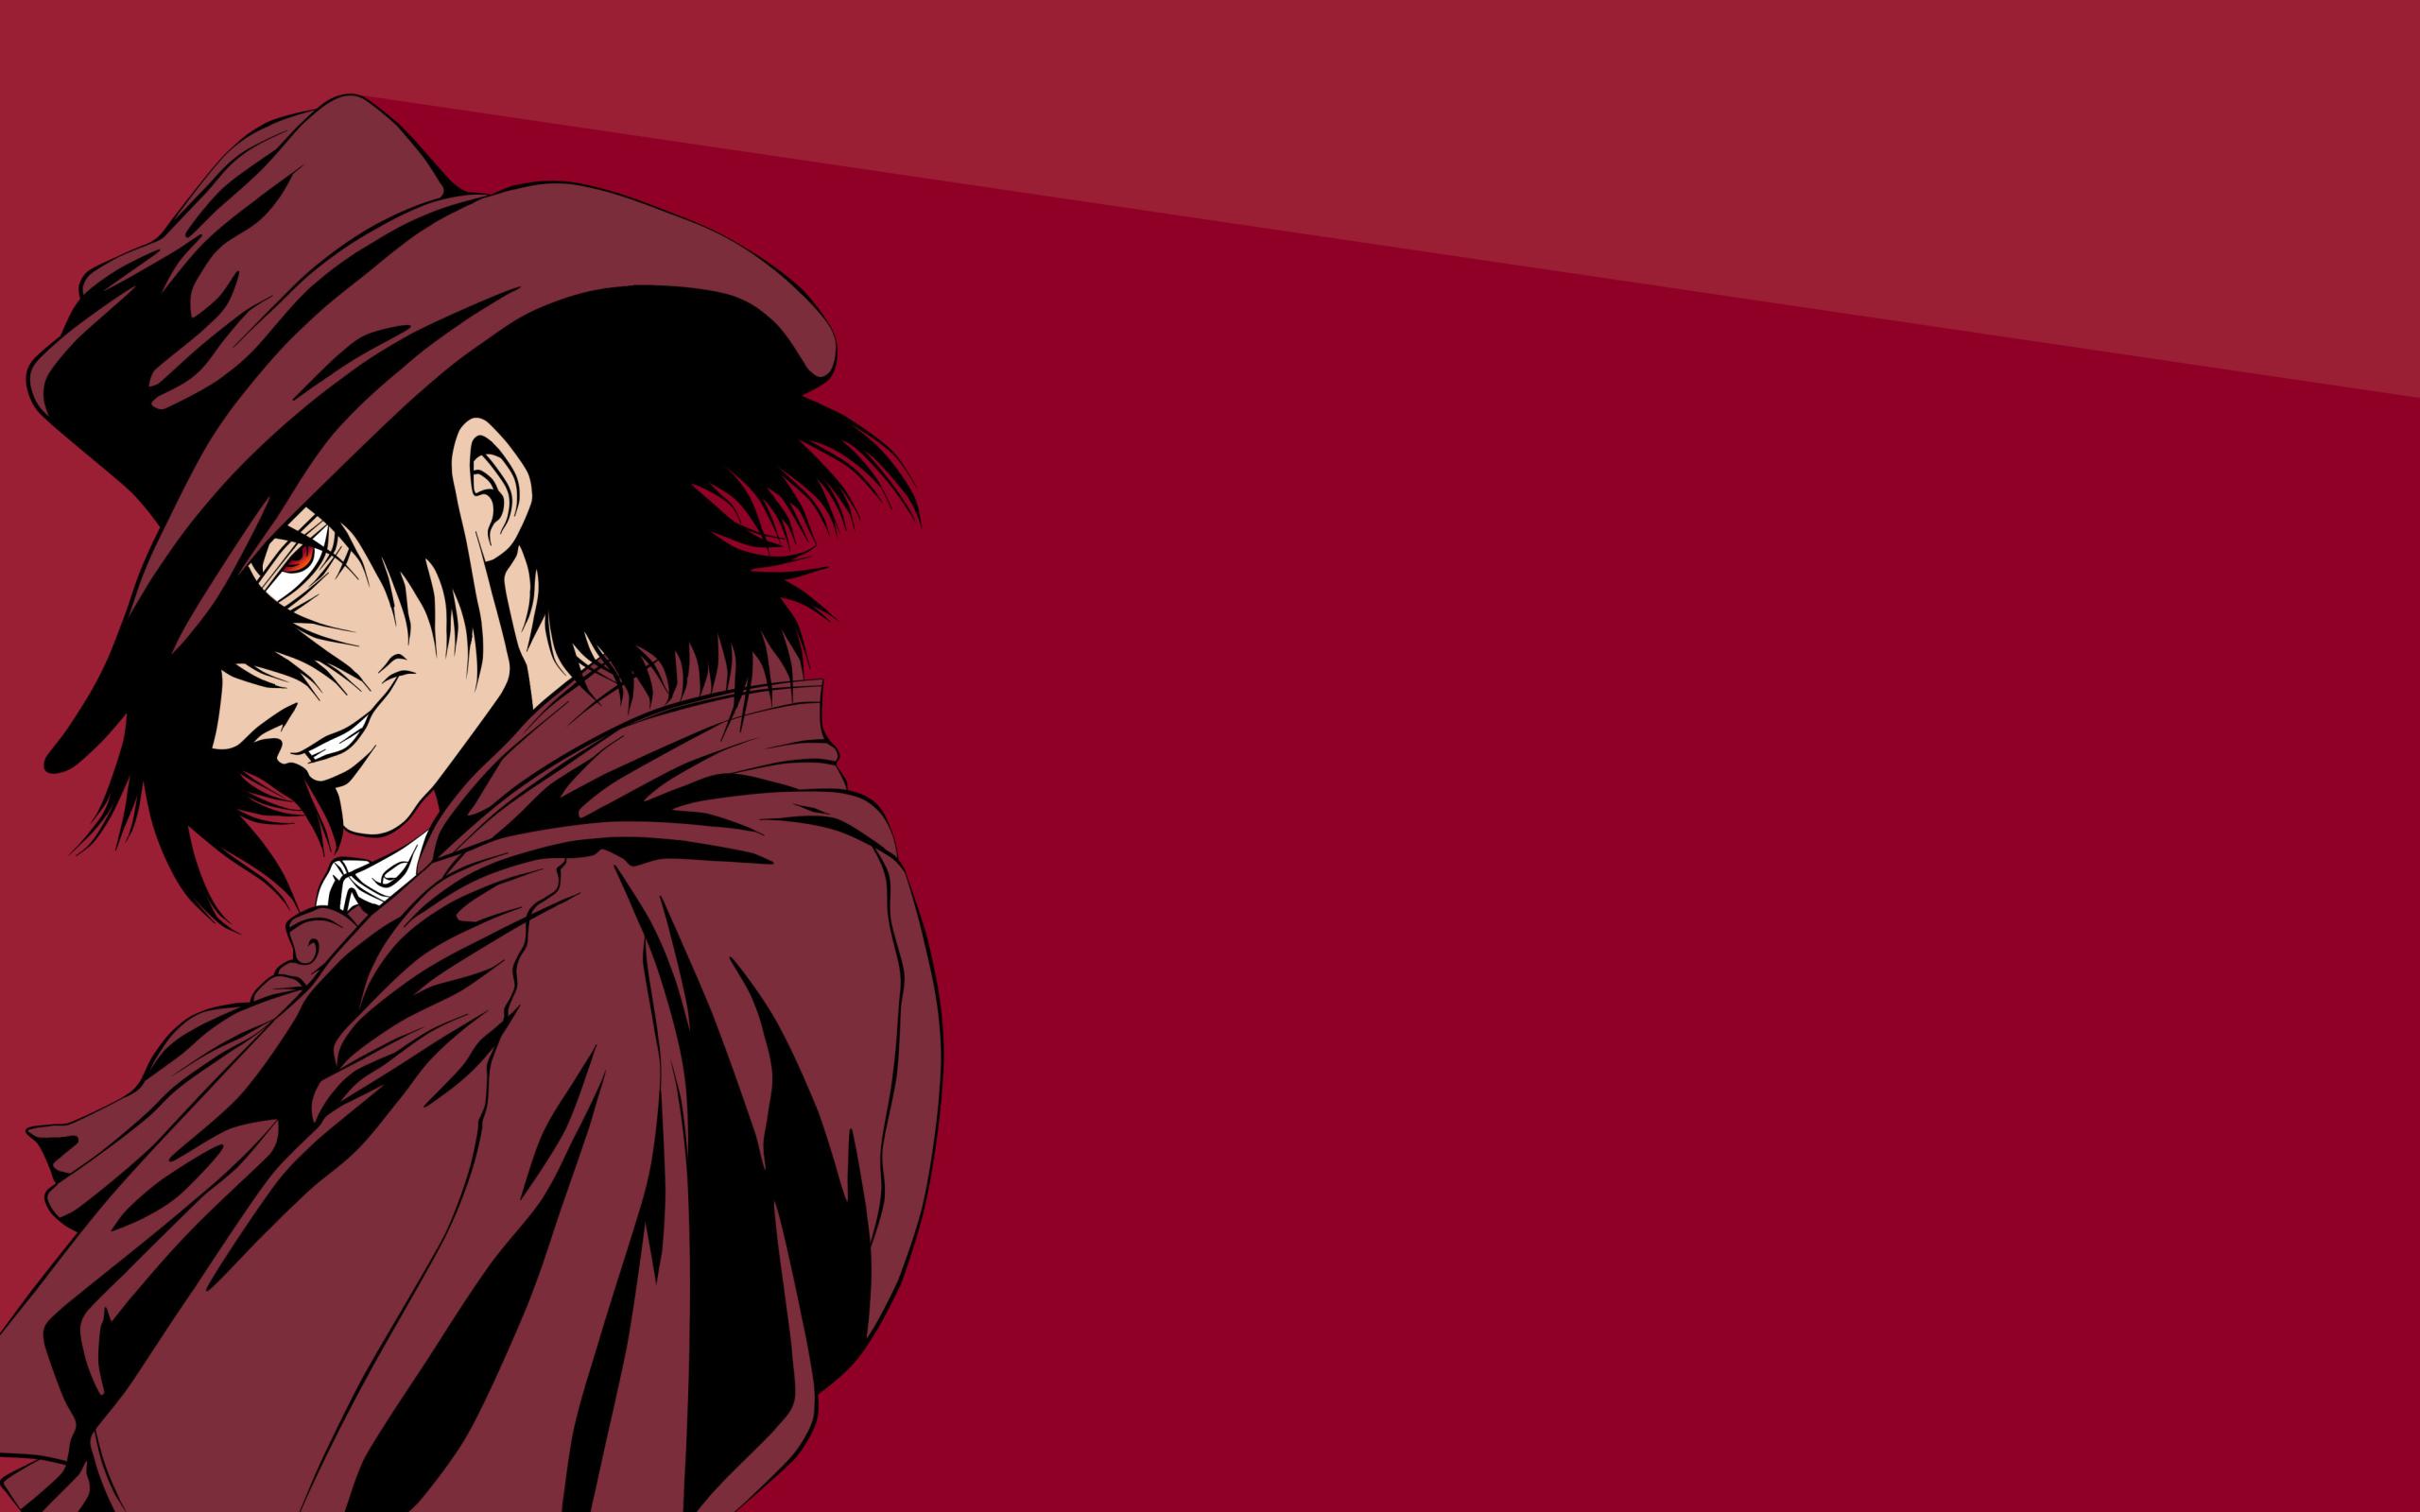 Alucard Hellsing Anime Resolution